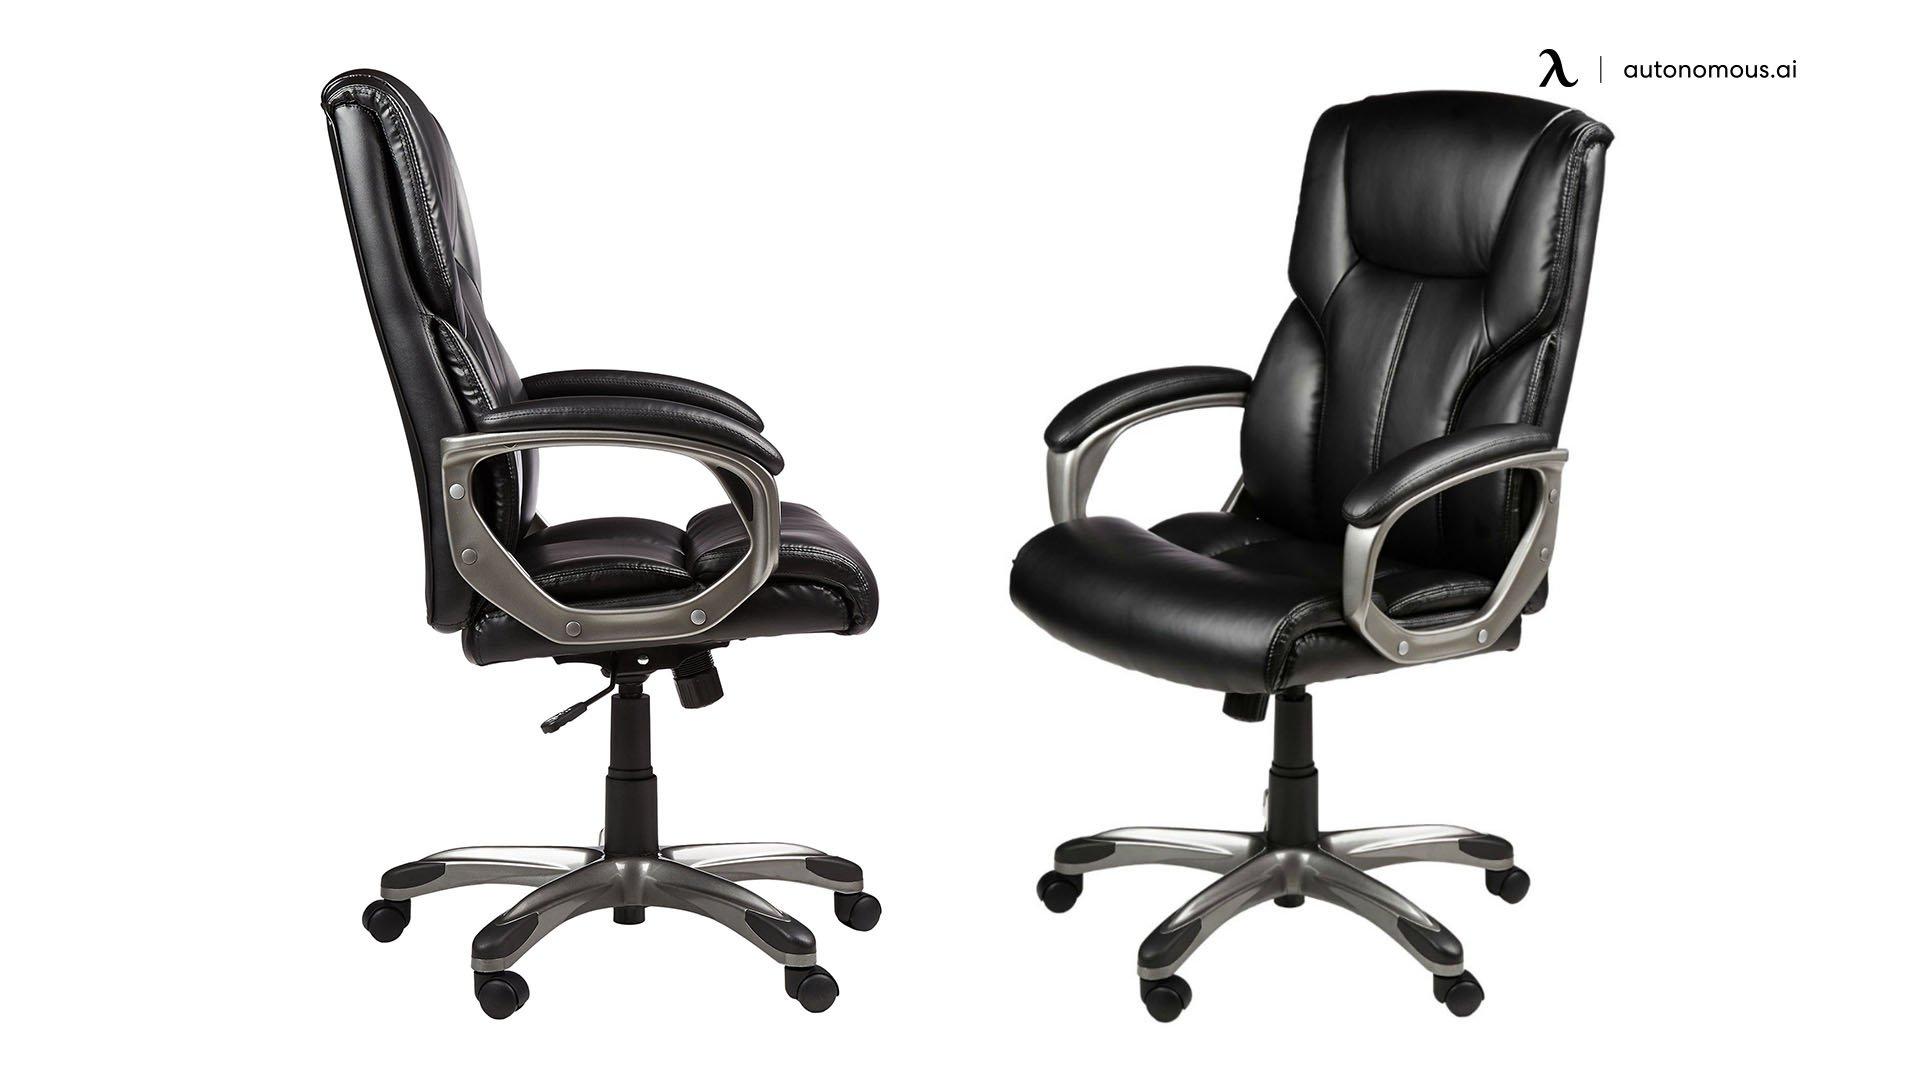 High-back Executive Chair by AmazonBasics